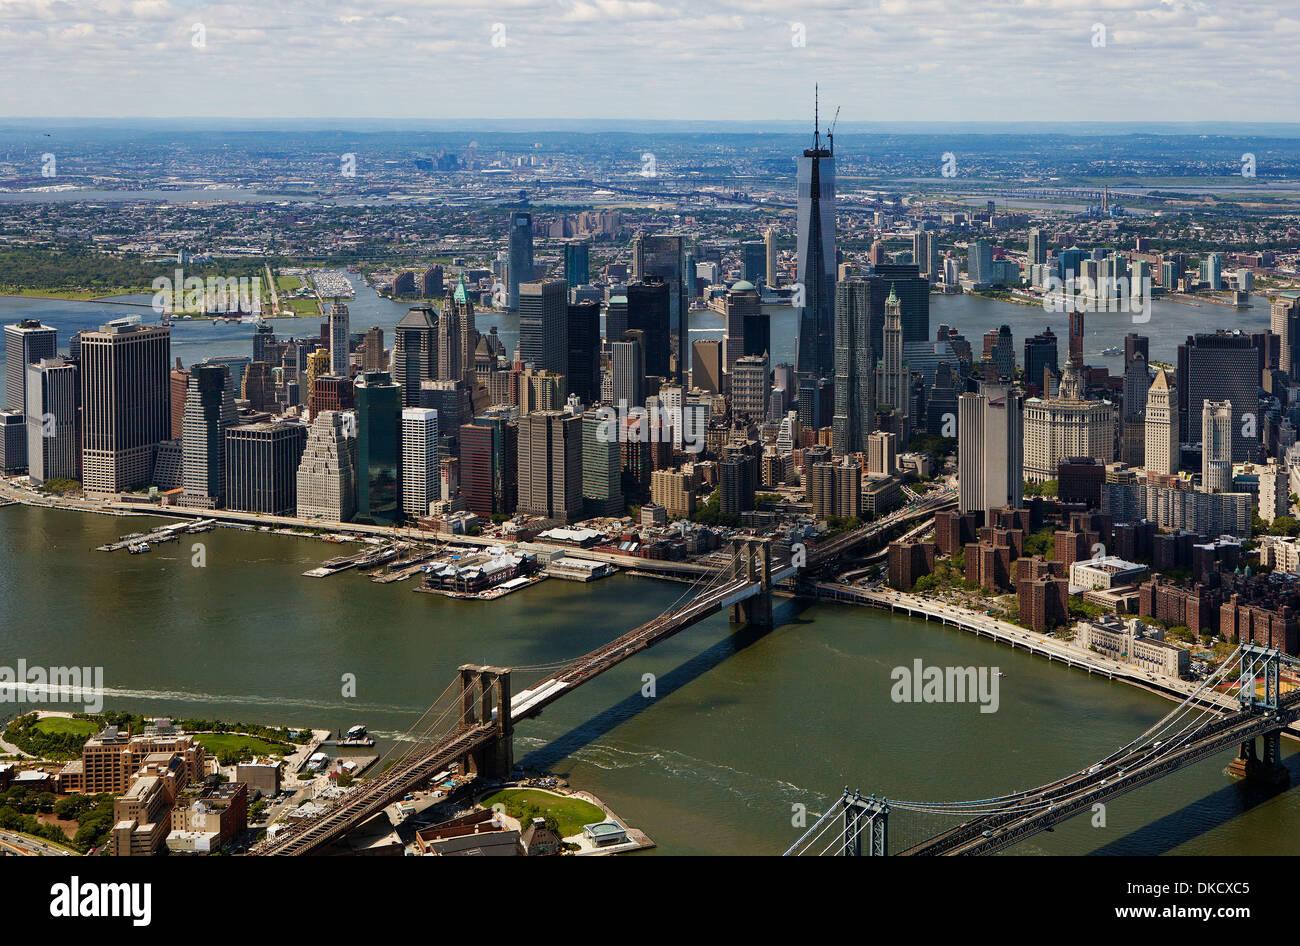 aerial photograph Lower Manhattan, East River, Brooklyn Bridge, New York City - Stock Image